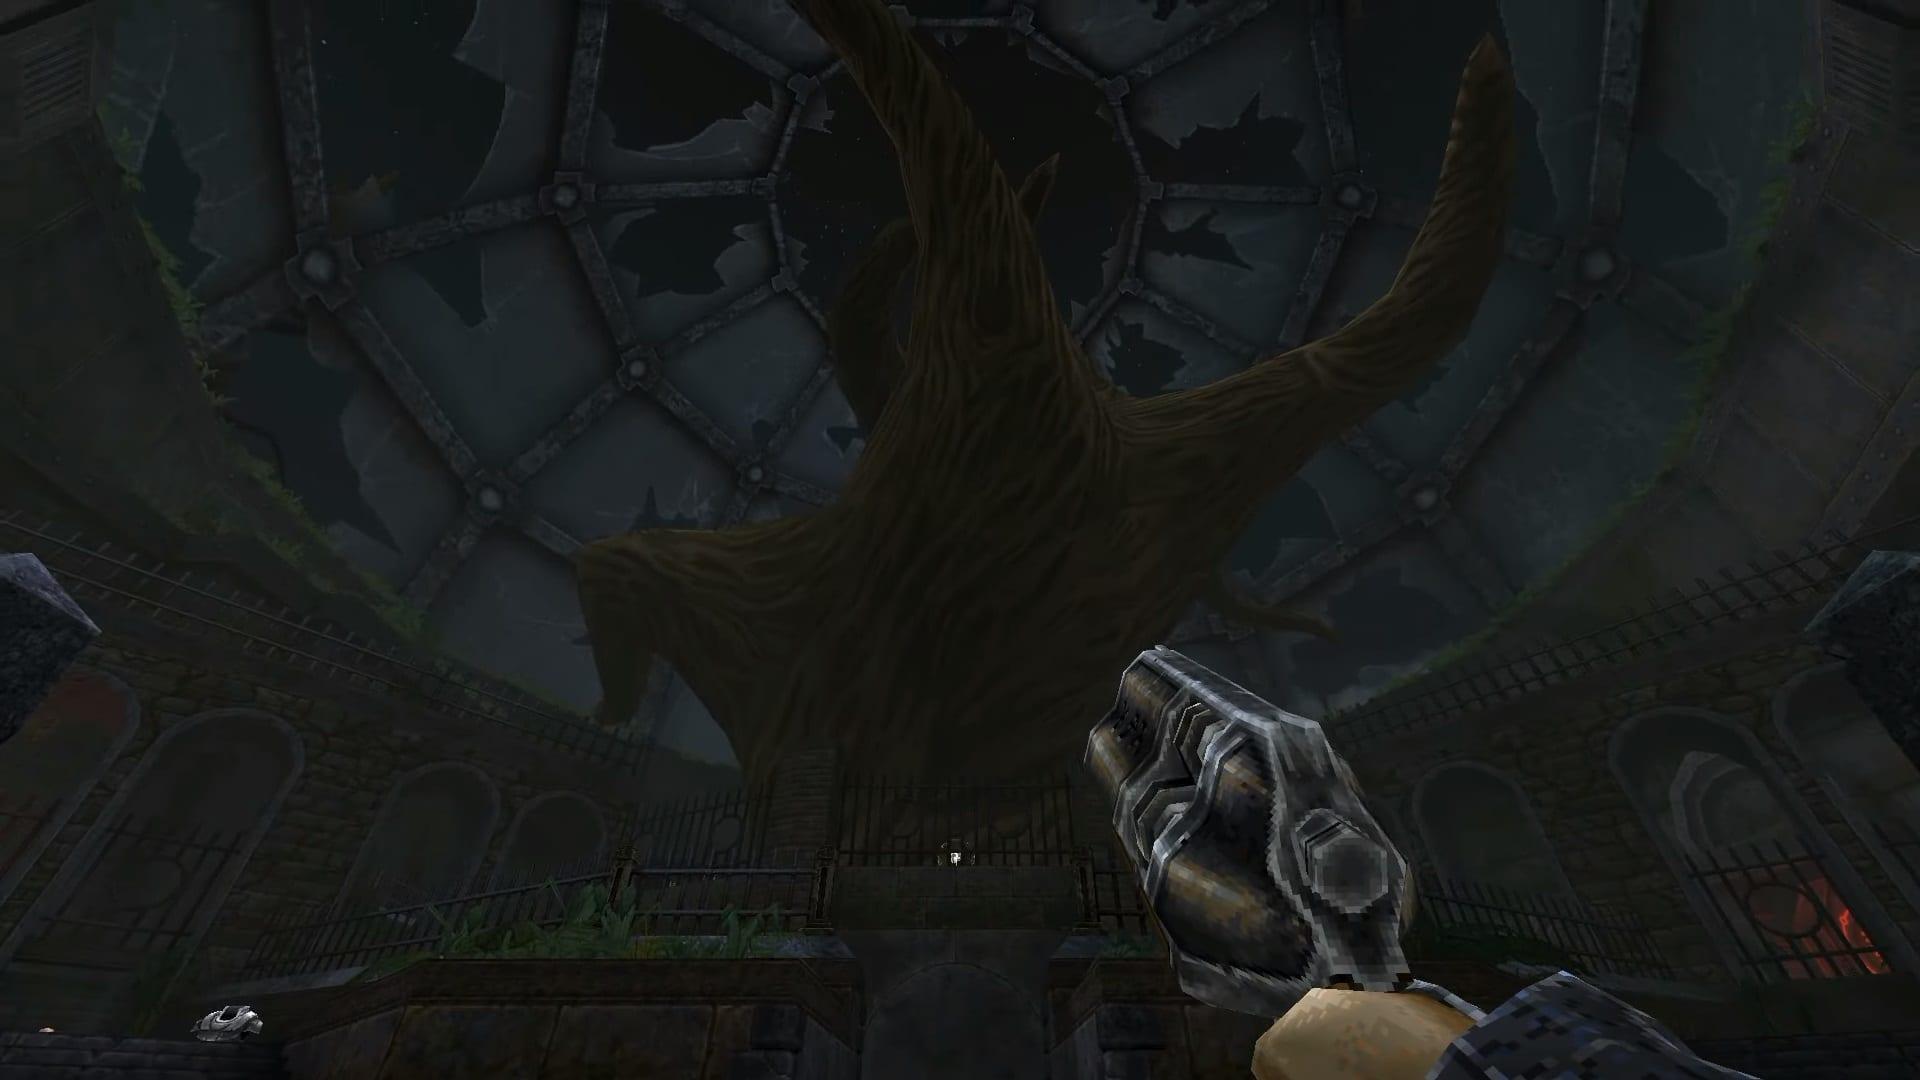 wrath aeon of ruin, update